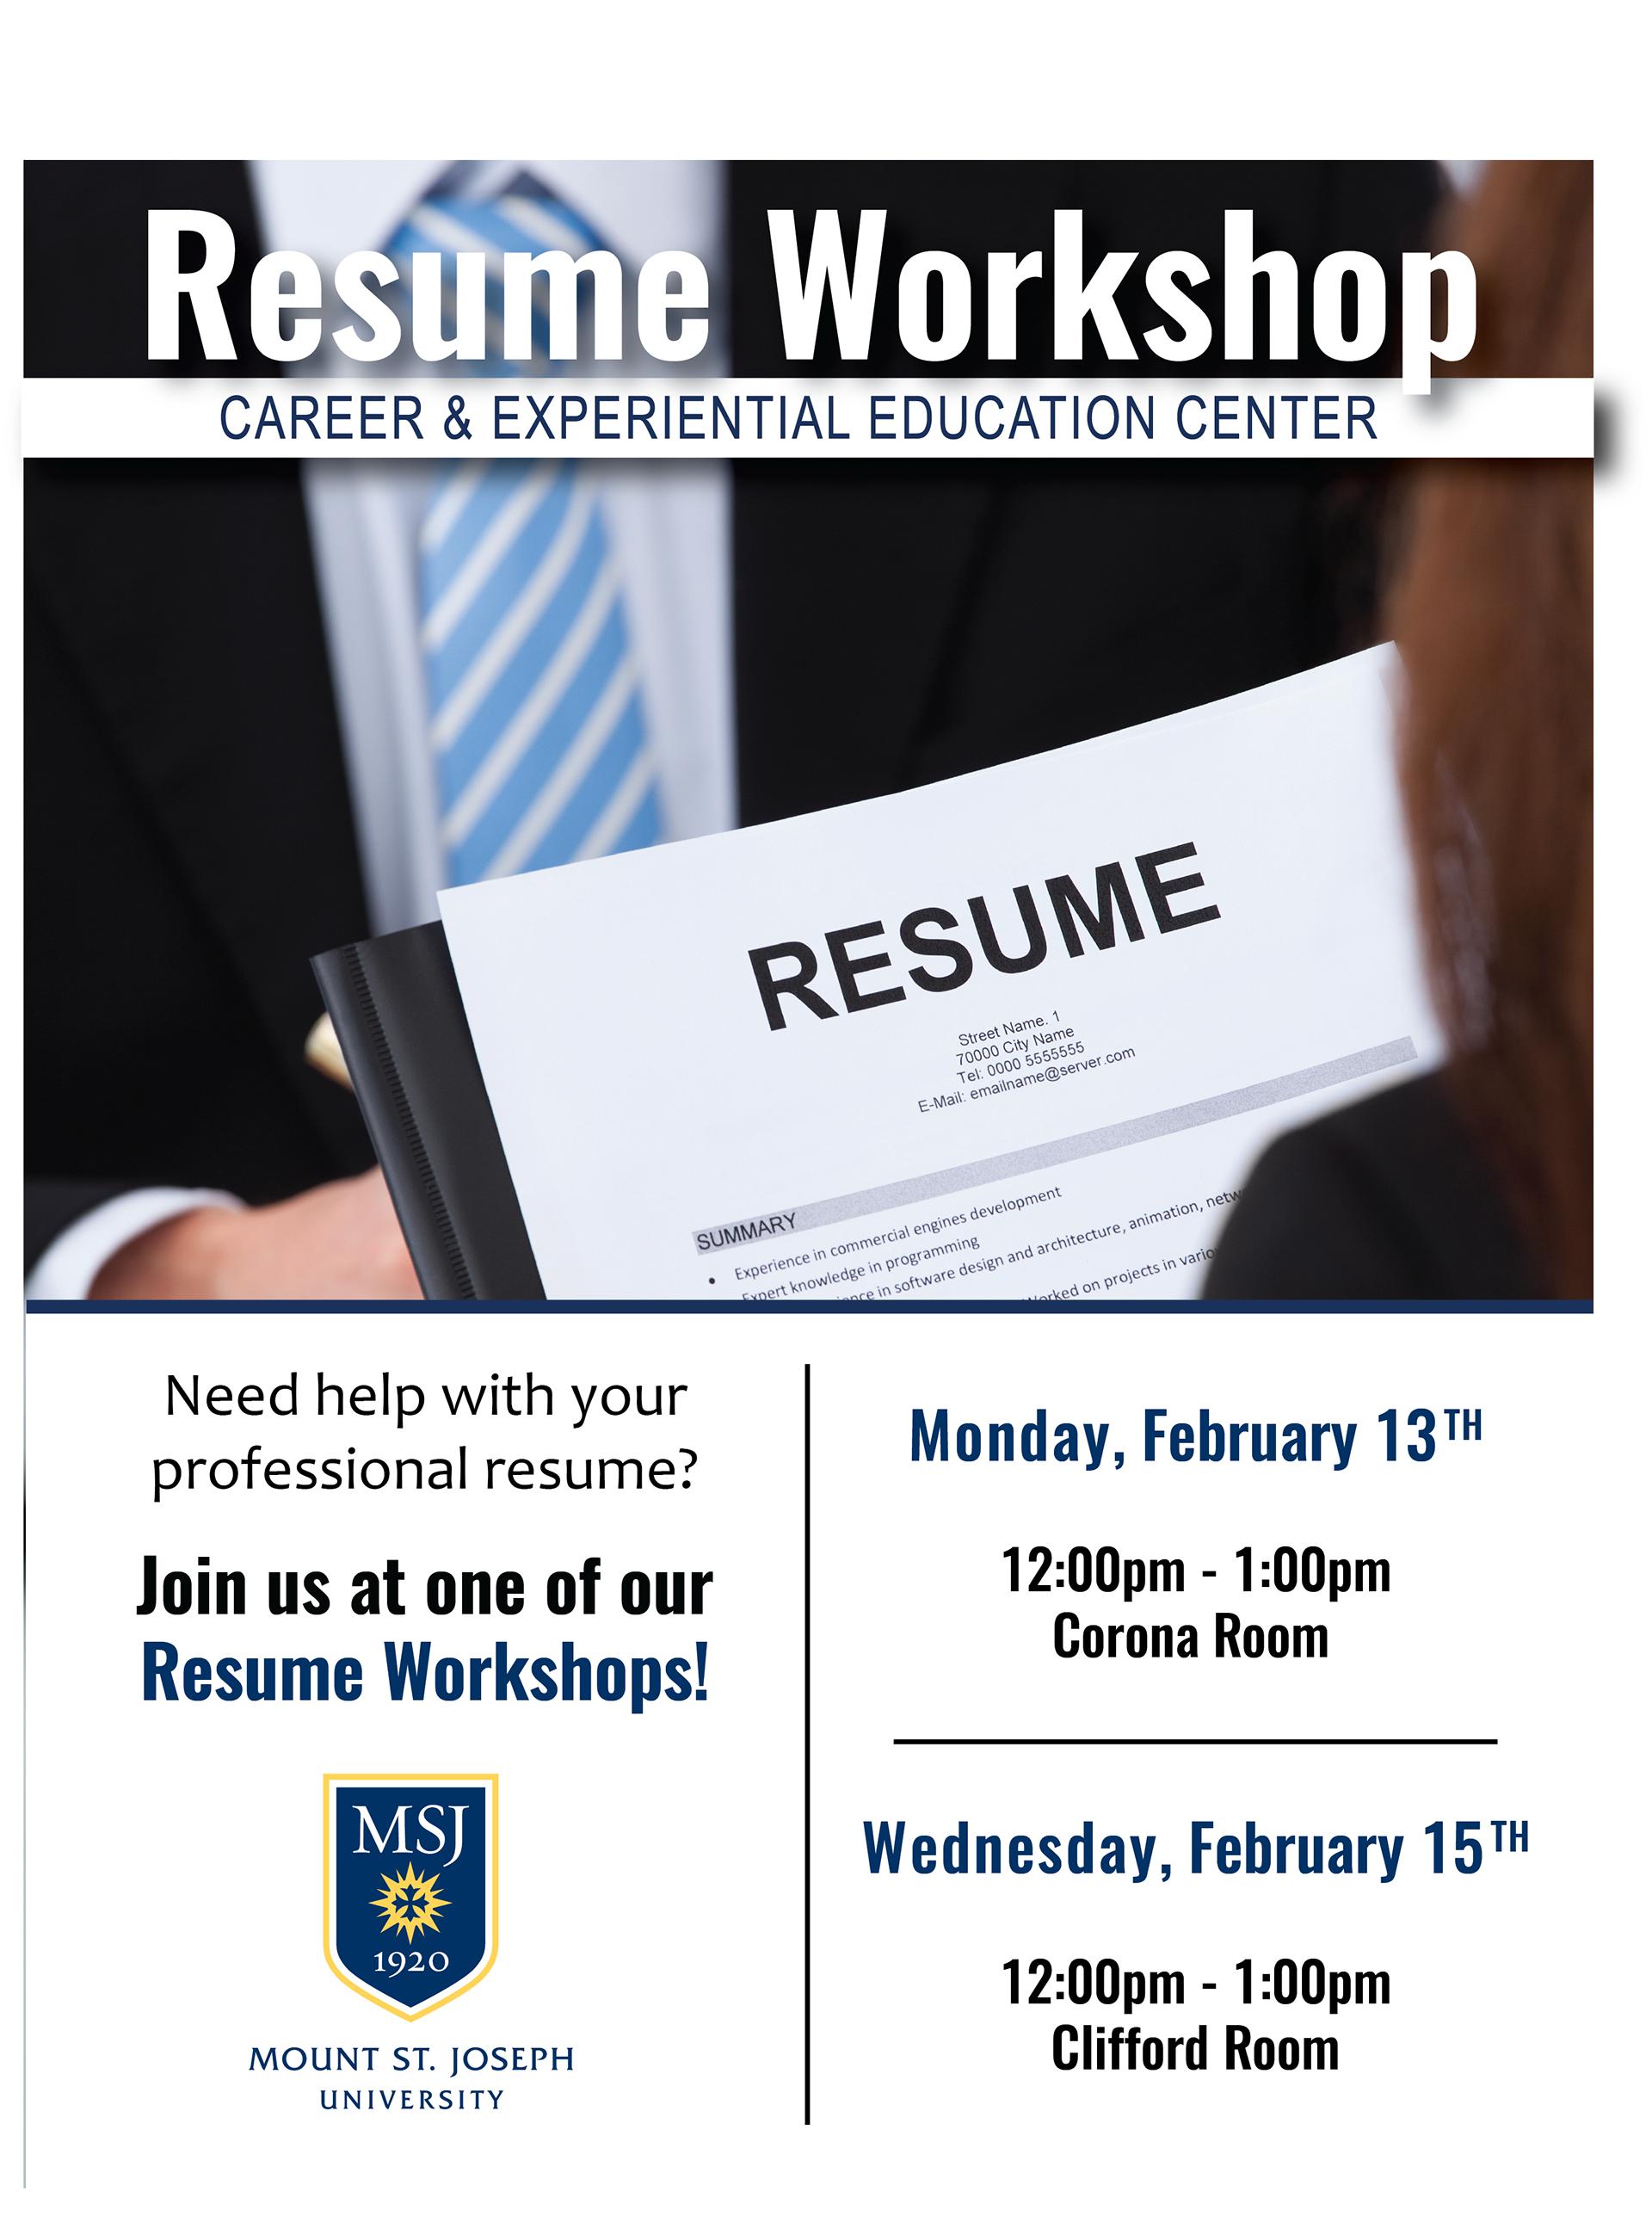 William Glass - Resume Workshop Flyer